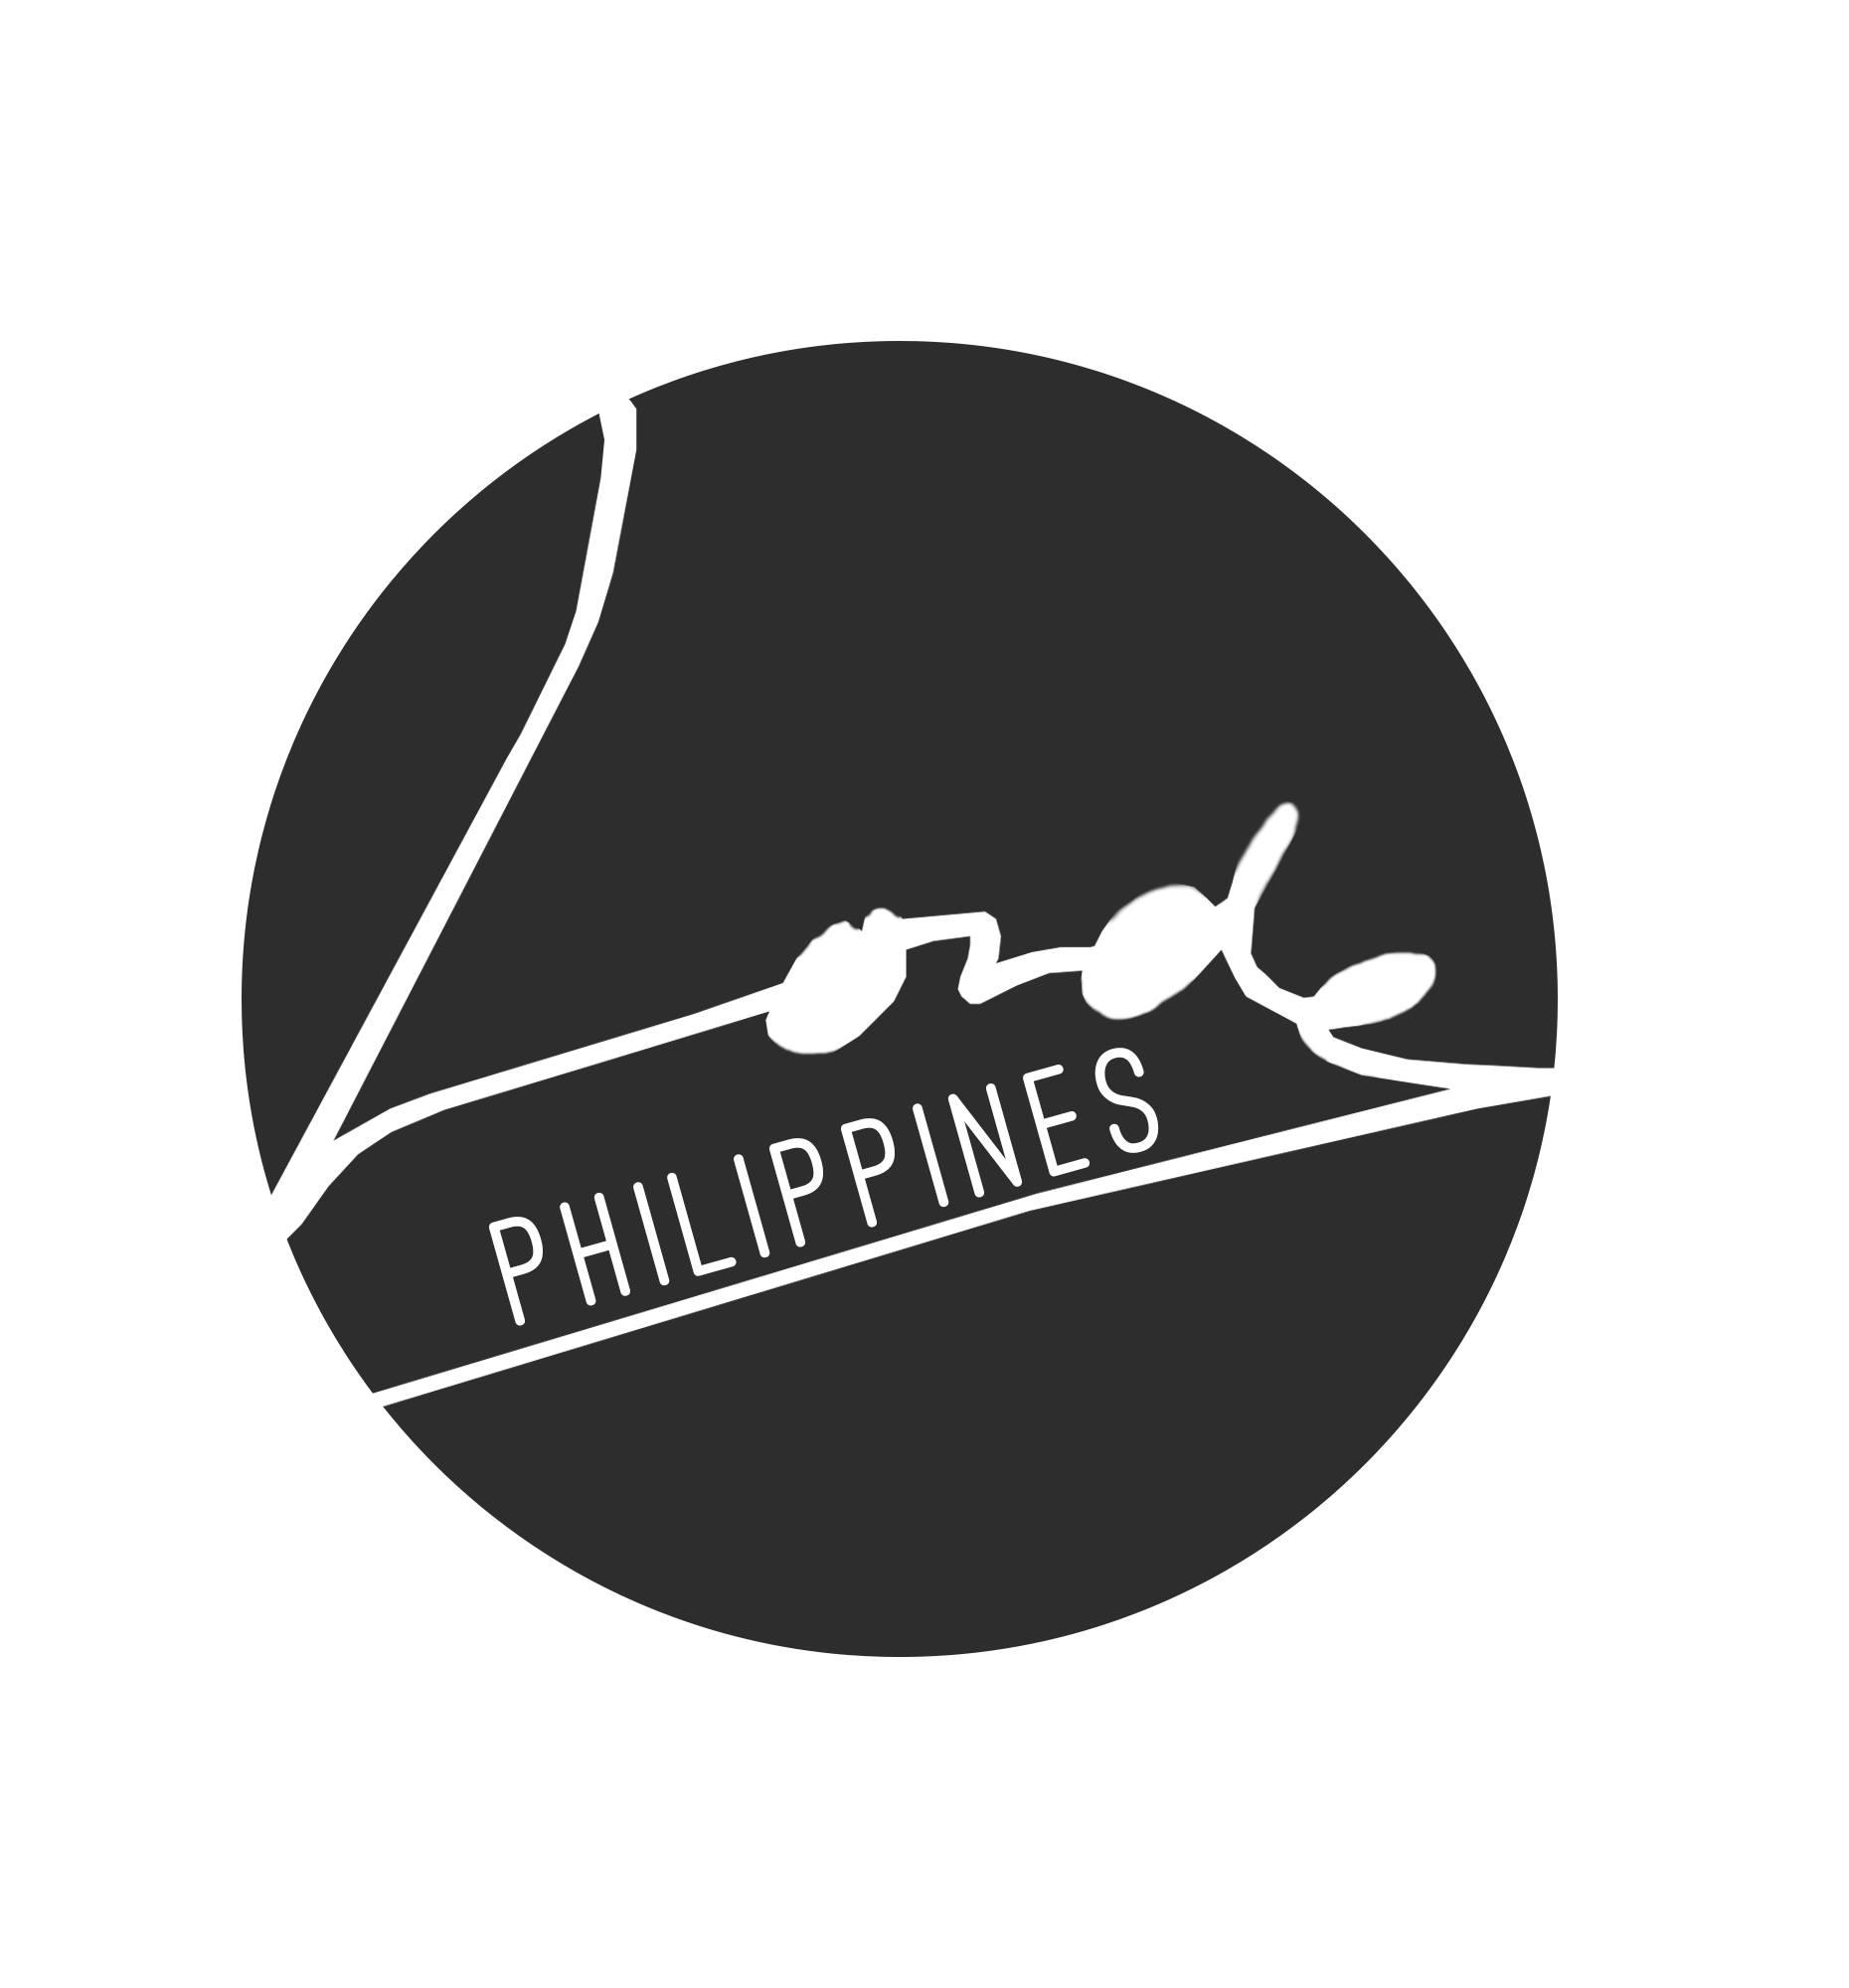 Lorde Philippines